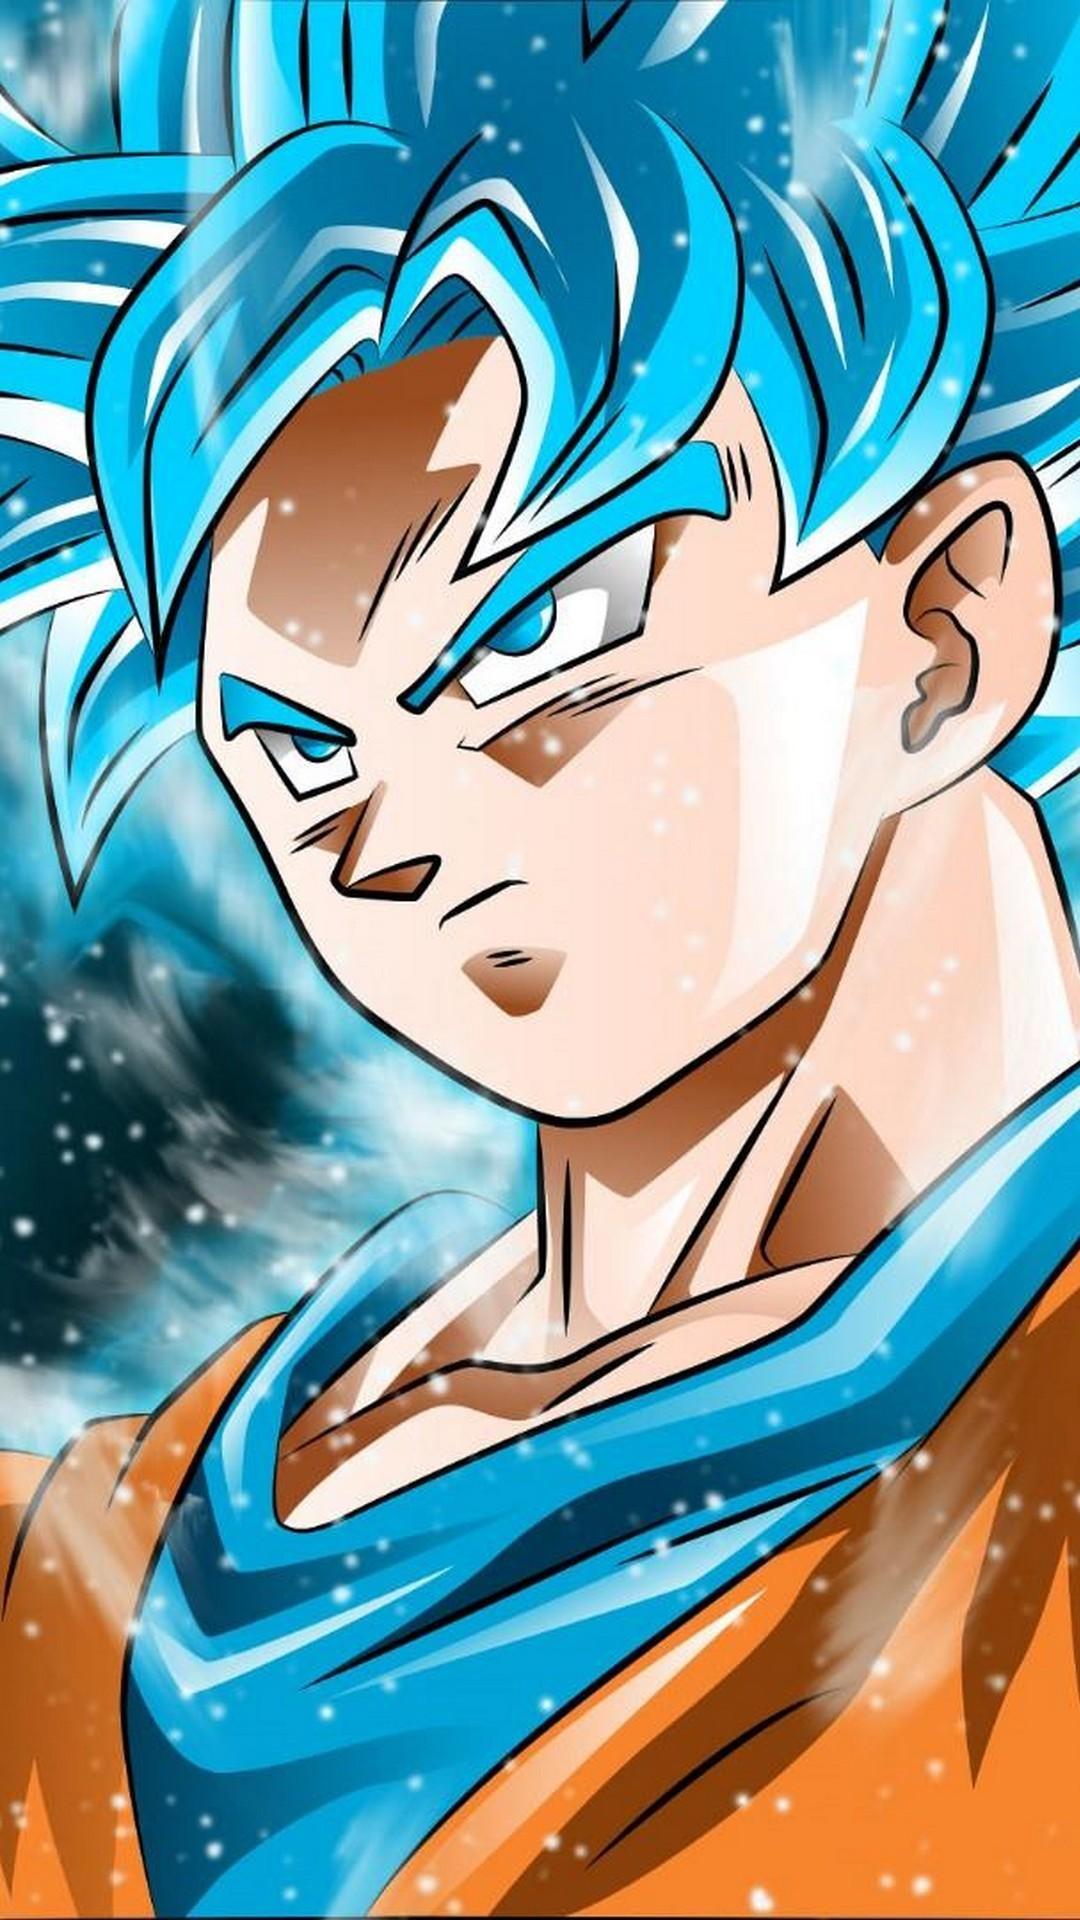 Free Download Iphone 8 Wallpaper Goku Ssj Blue 2019 3d Iphone